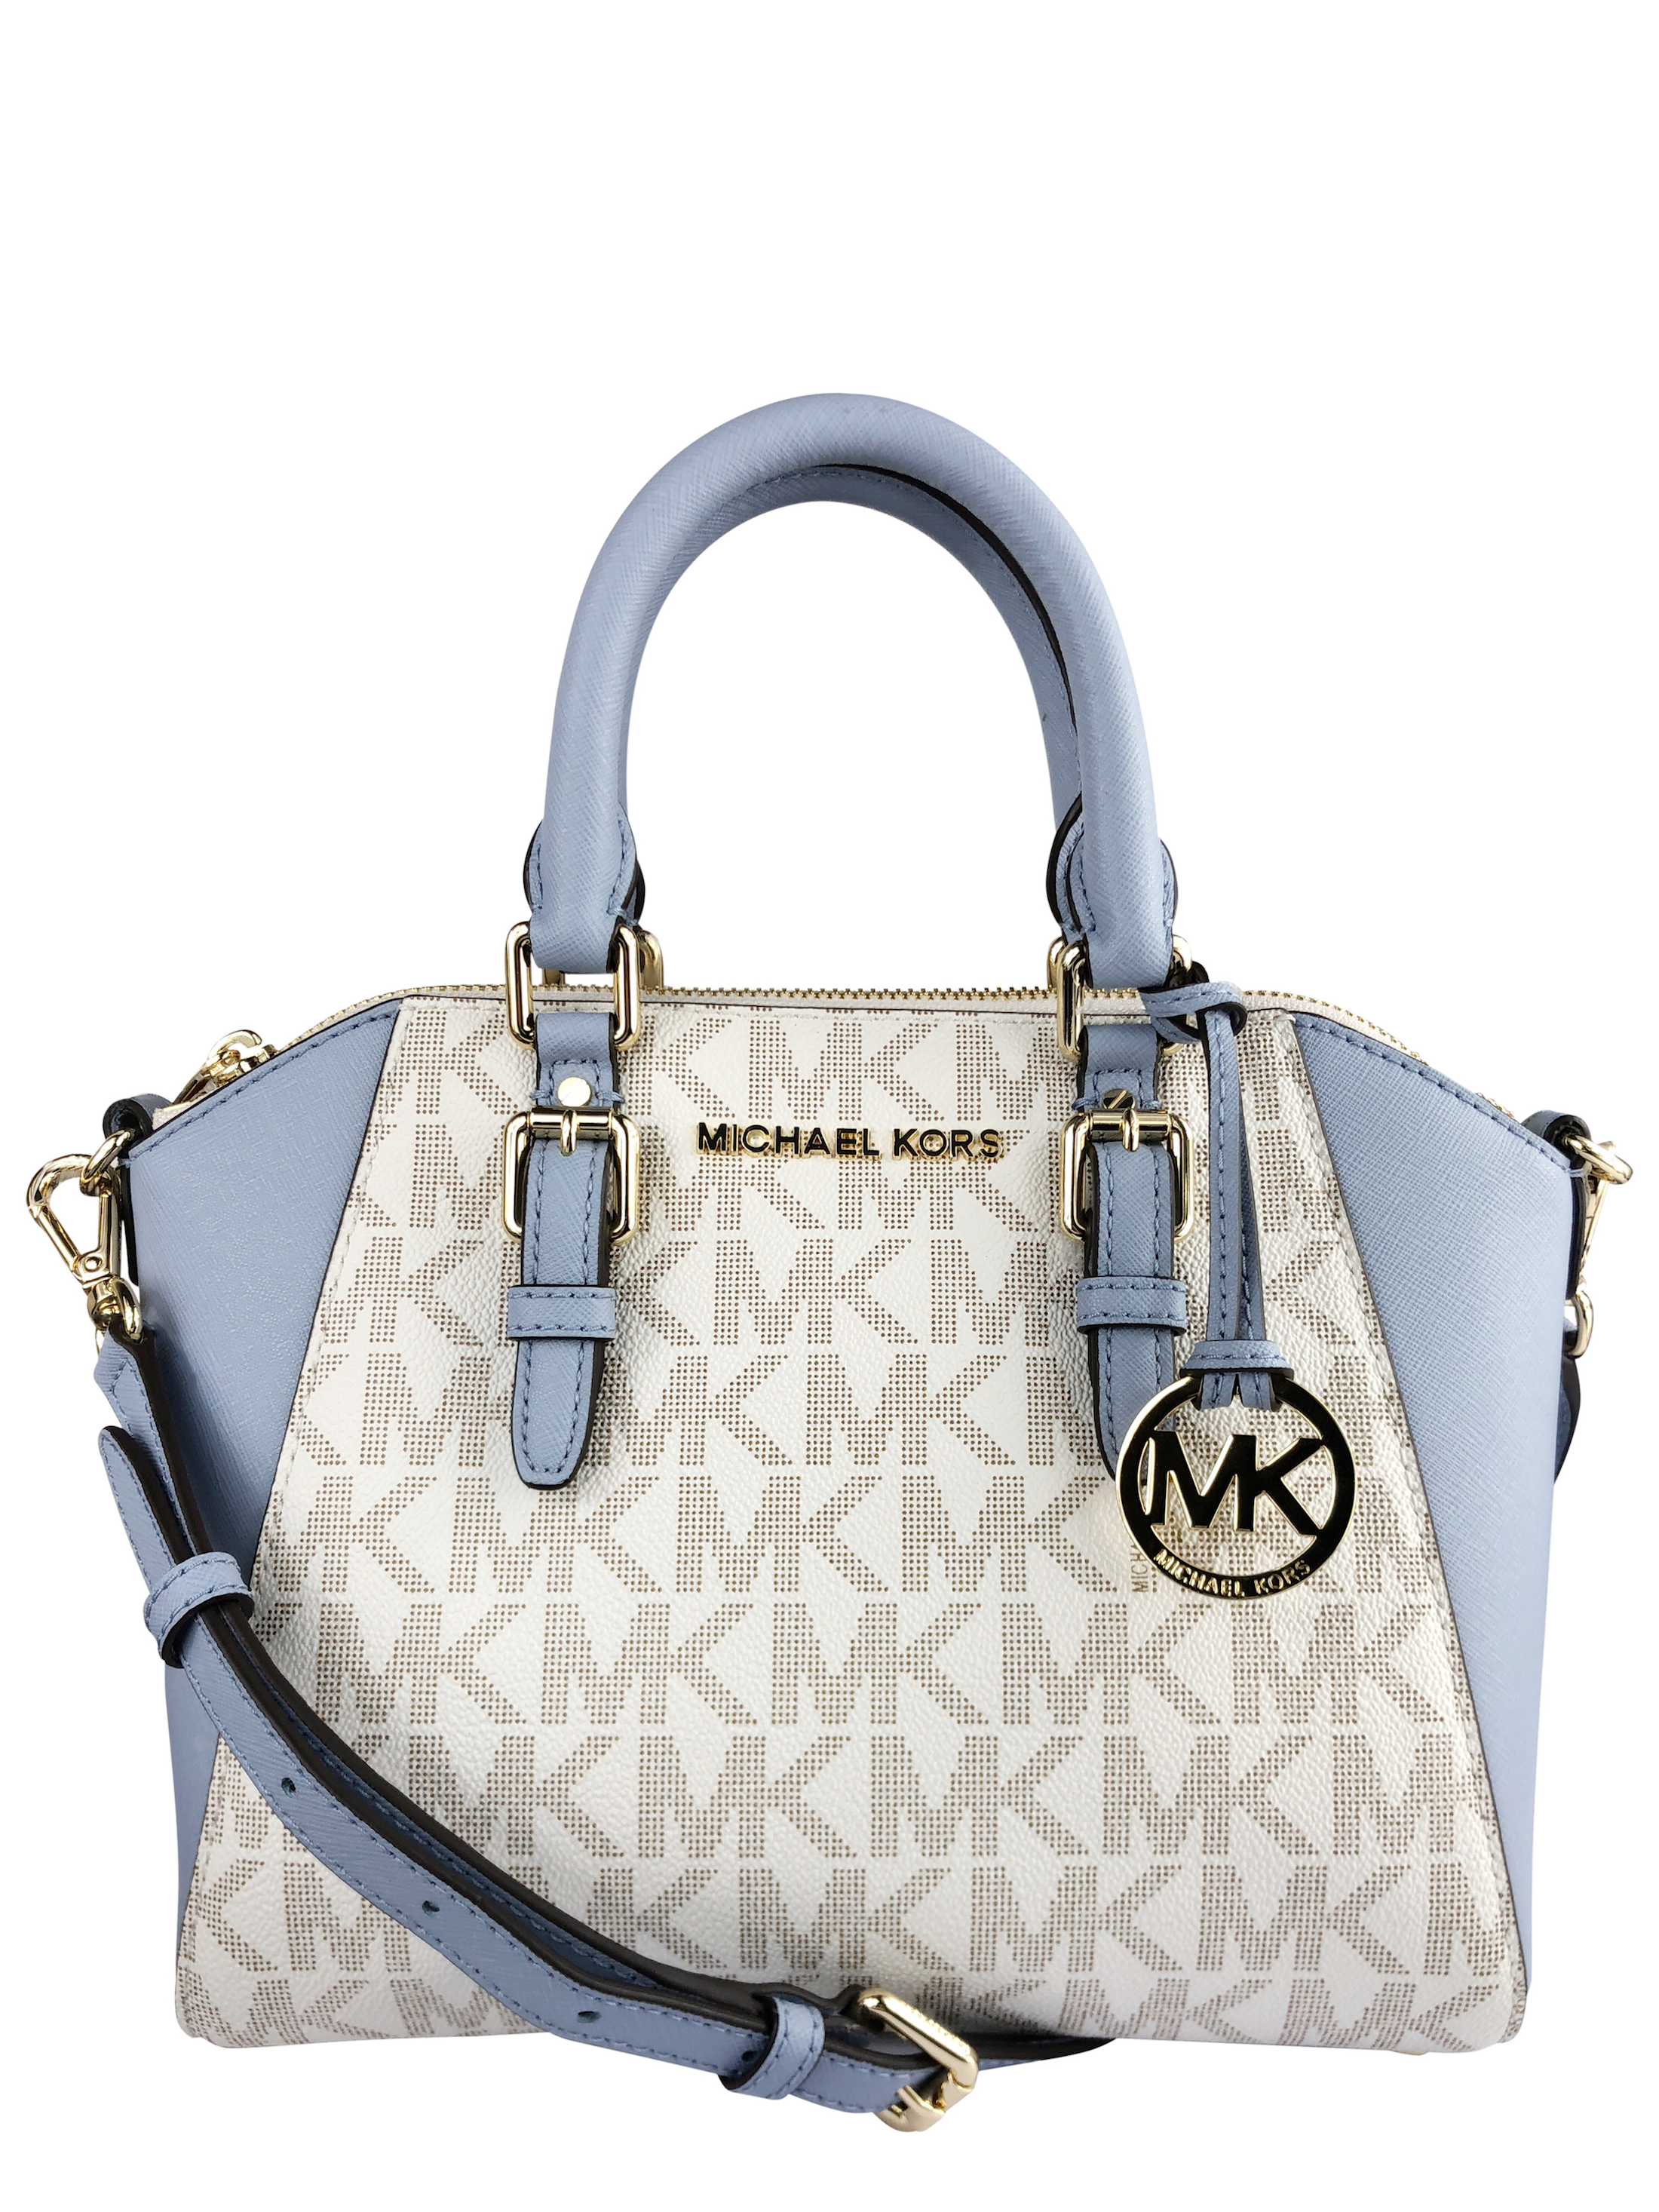 bdc85f5a1fbf ... where can i buy michael kors ciara medium messenger vanilla mk pale  blue crossbody small bag